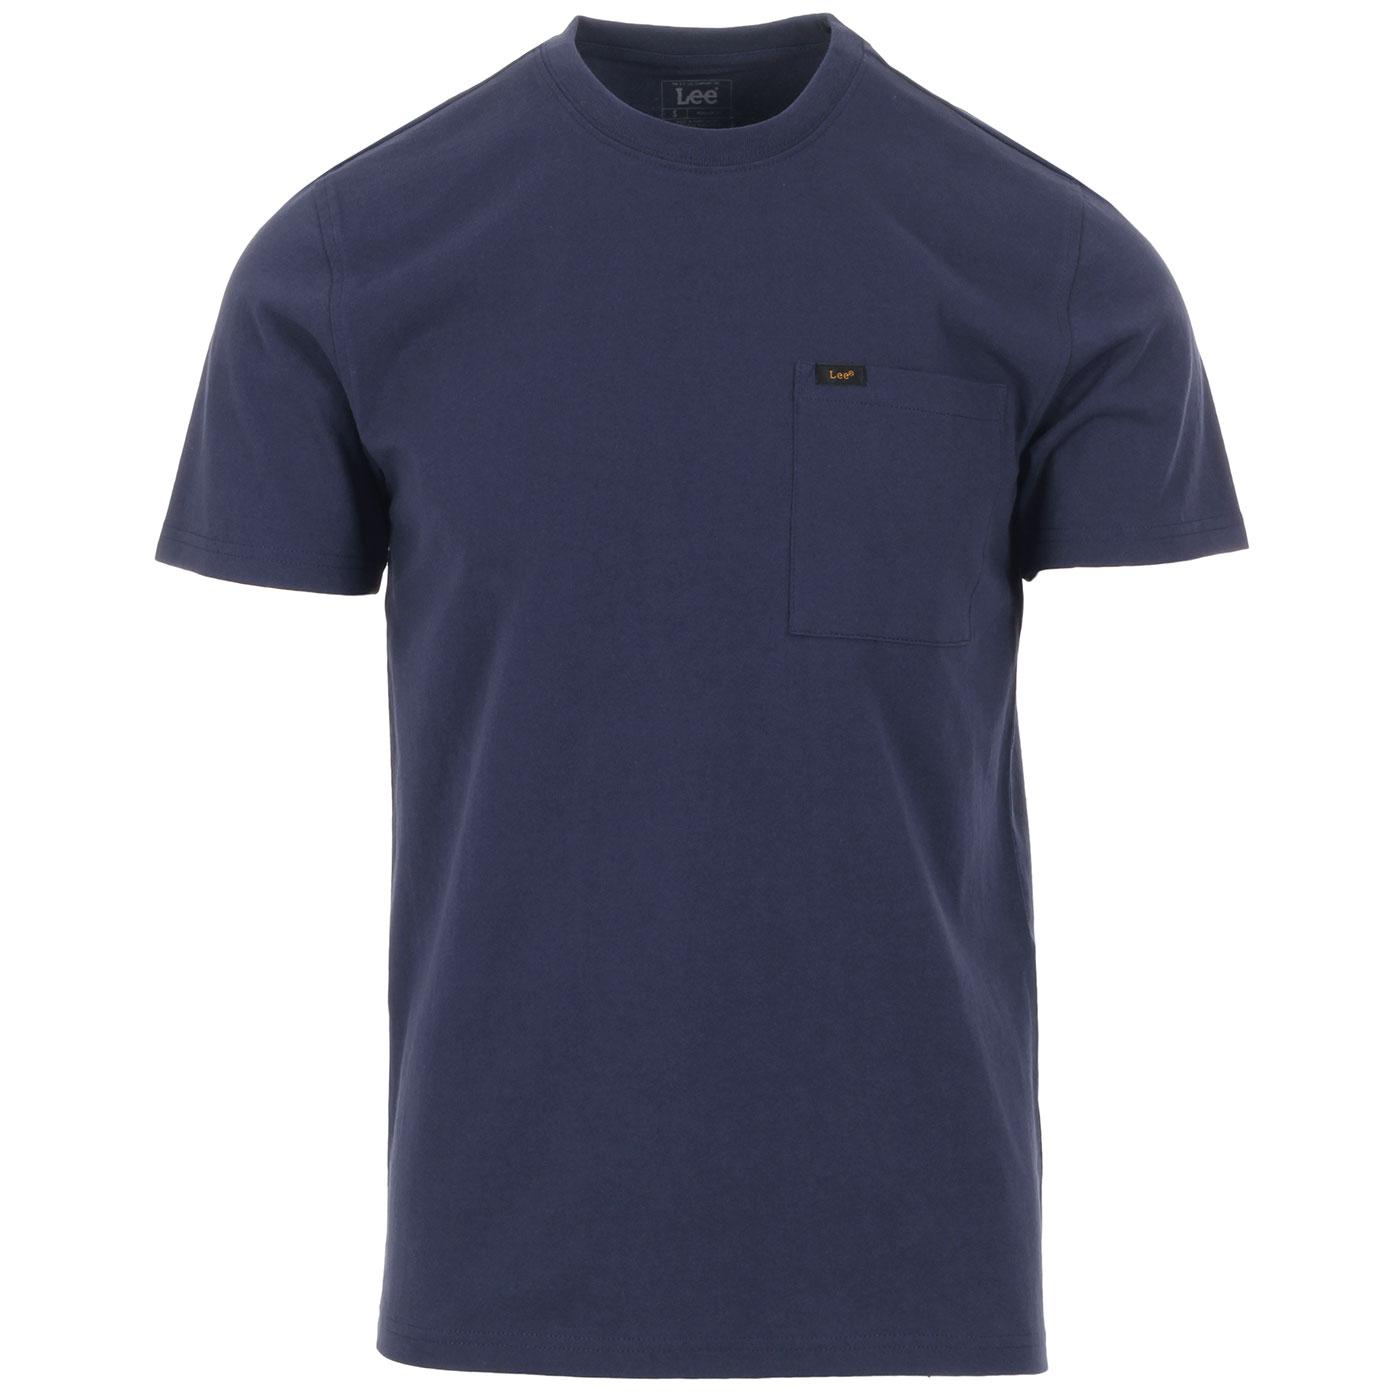 LEE JEANS Retro Cotton Pocket T-shirt - Dark Navy